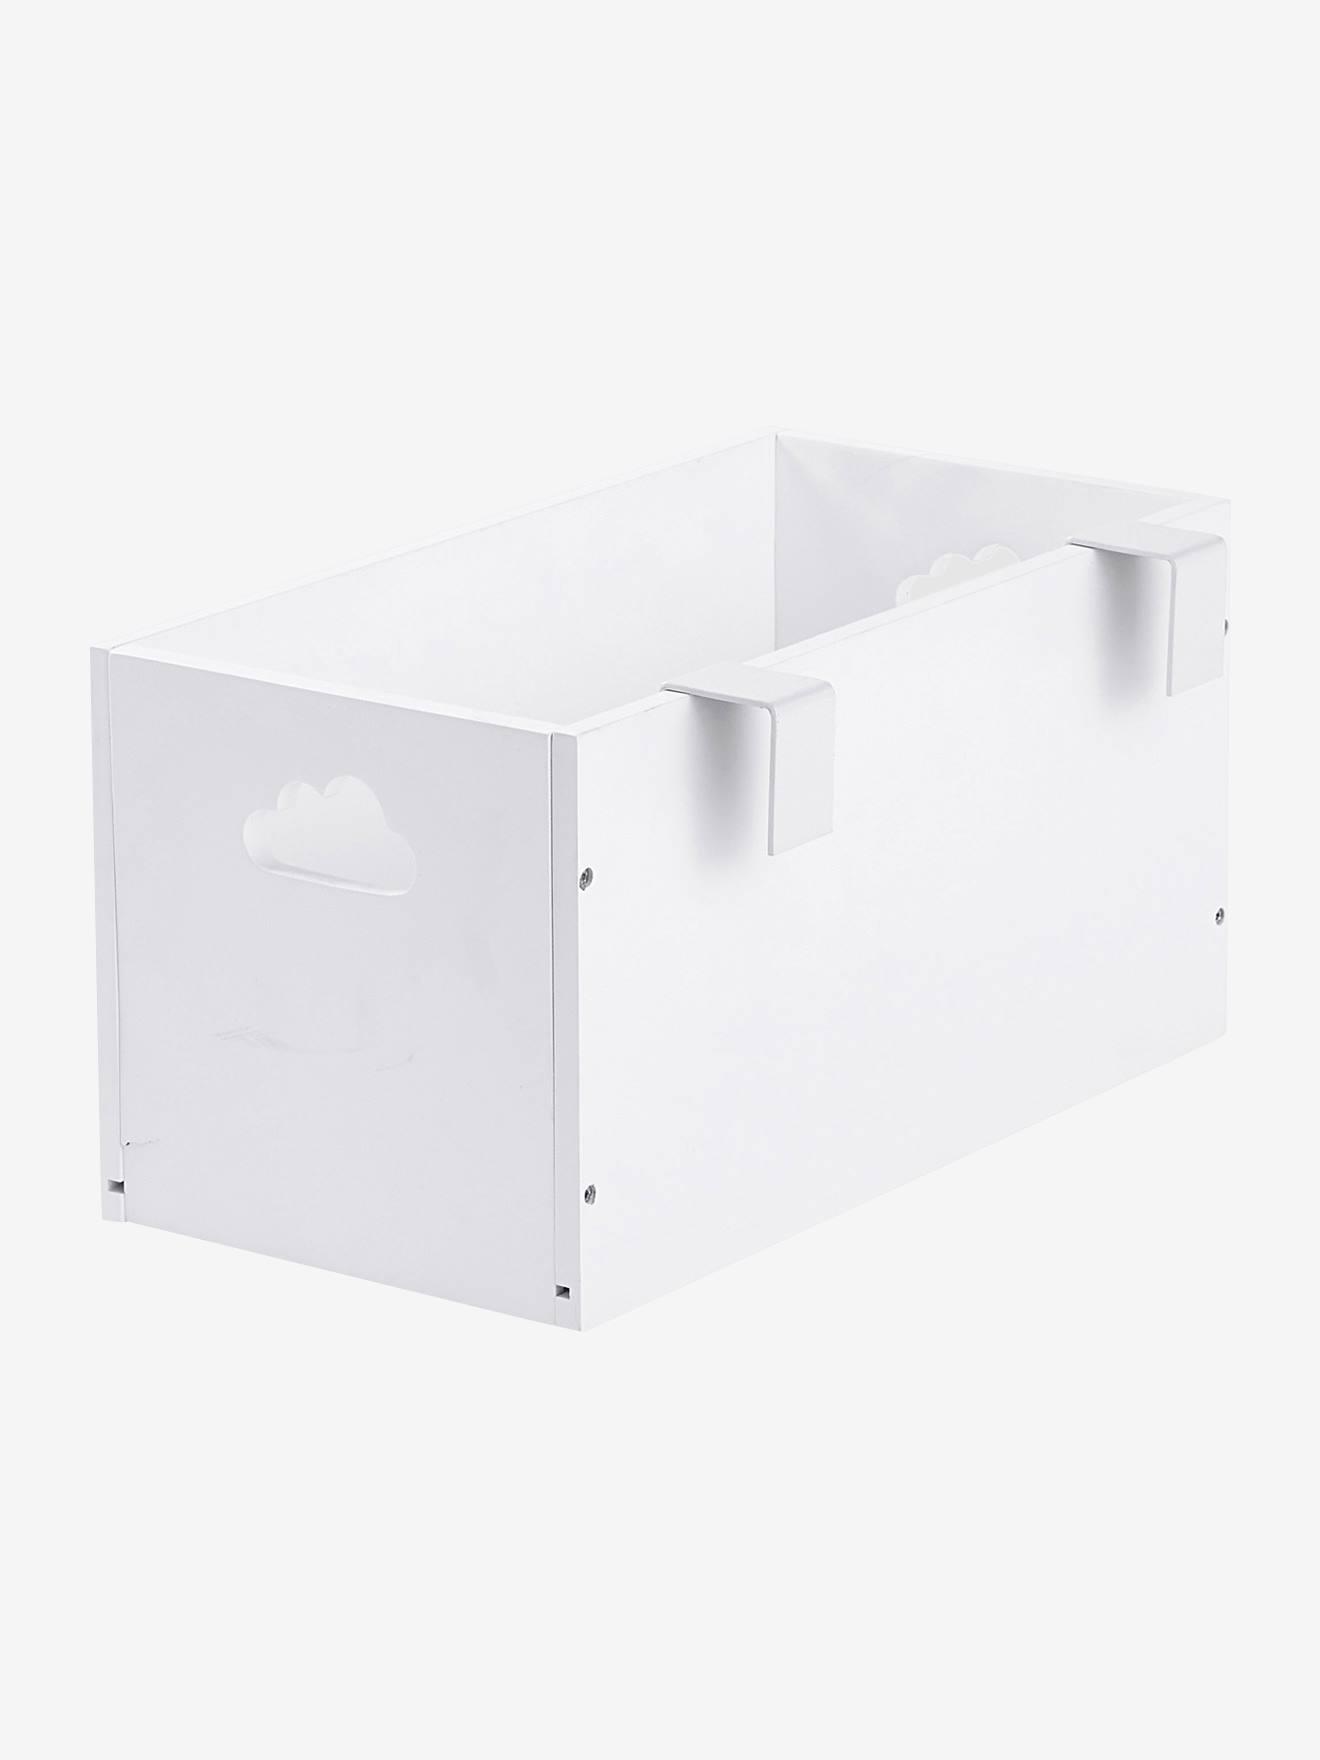 gallery of meubles et linge de de rangement spciale table langer with table lumineuse dessin ikea. Black Bedroom Furniture Sets. Home Design Ideas